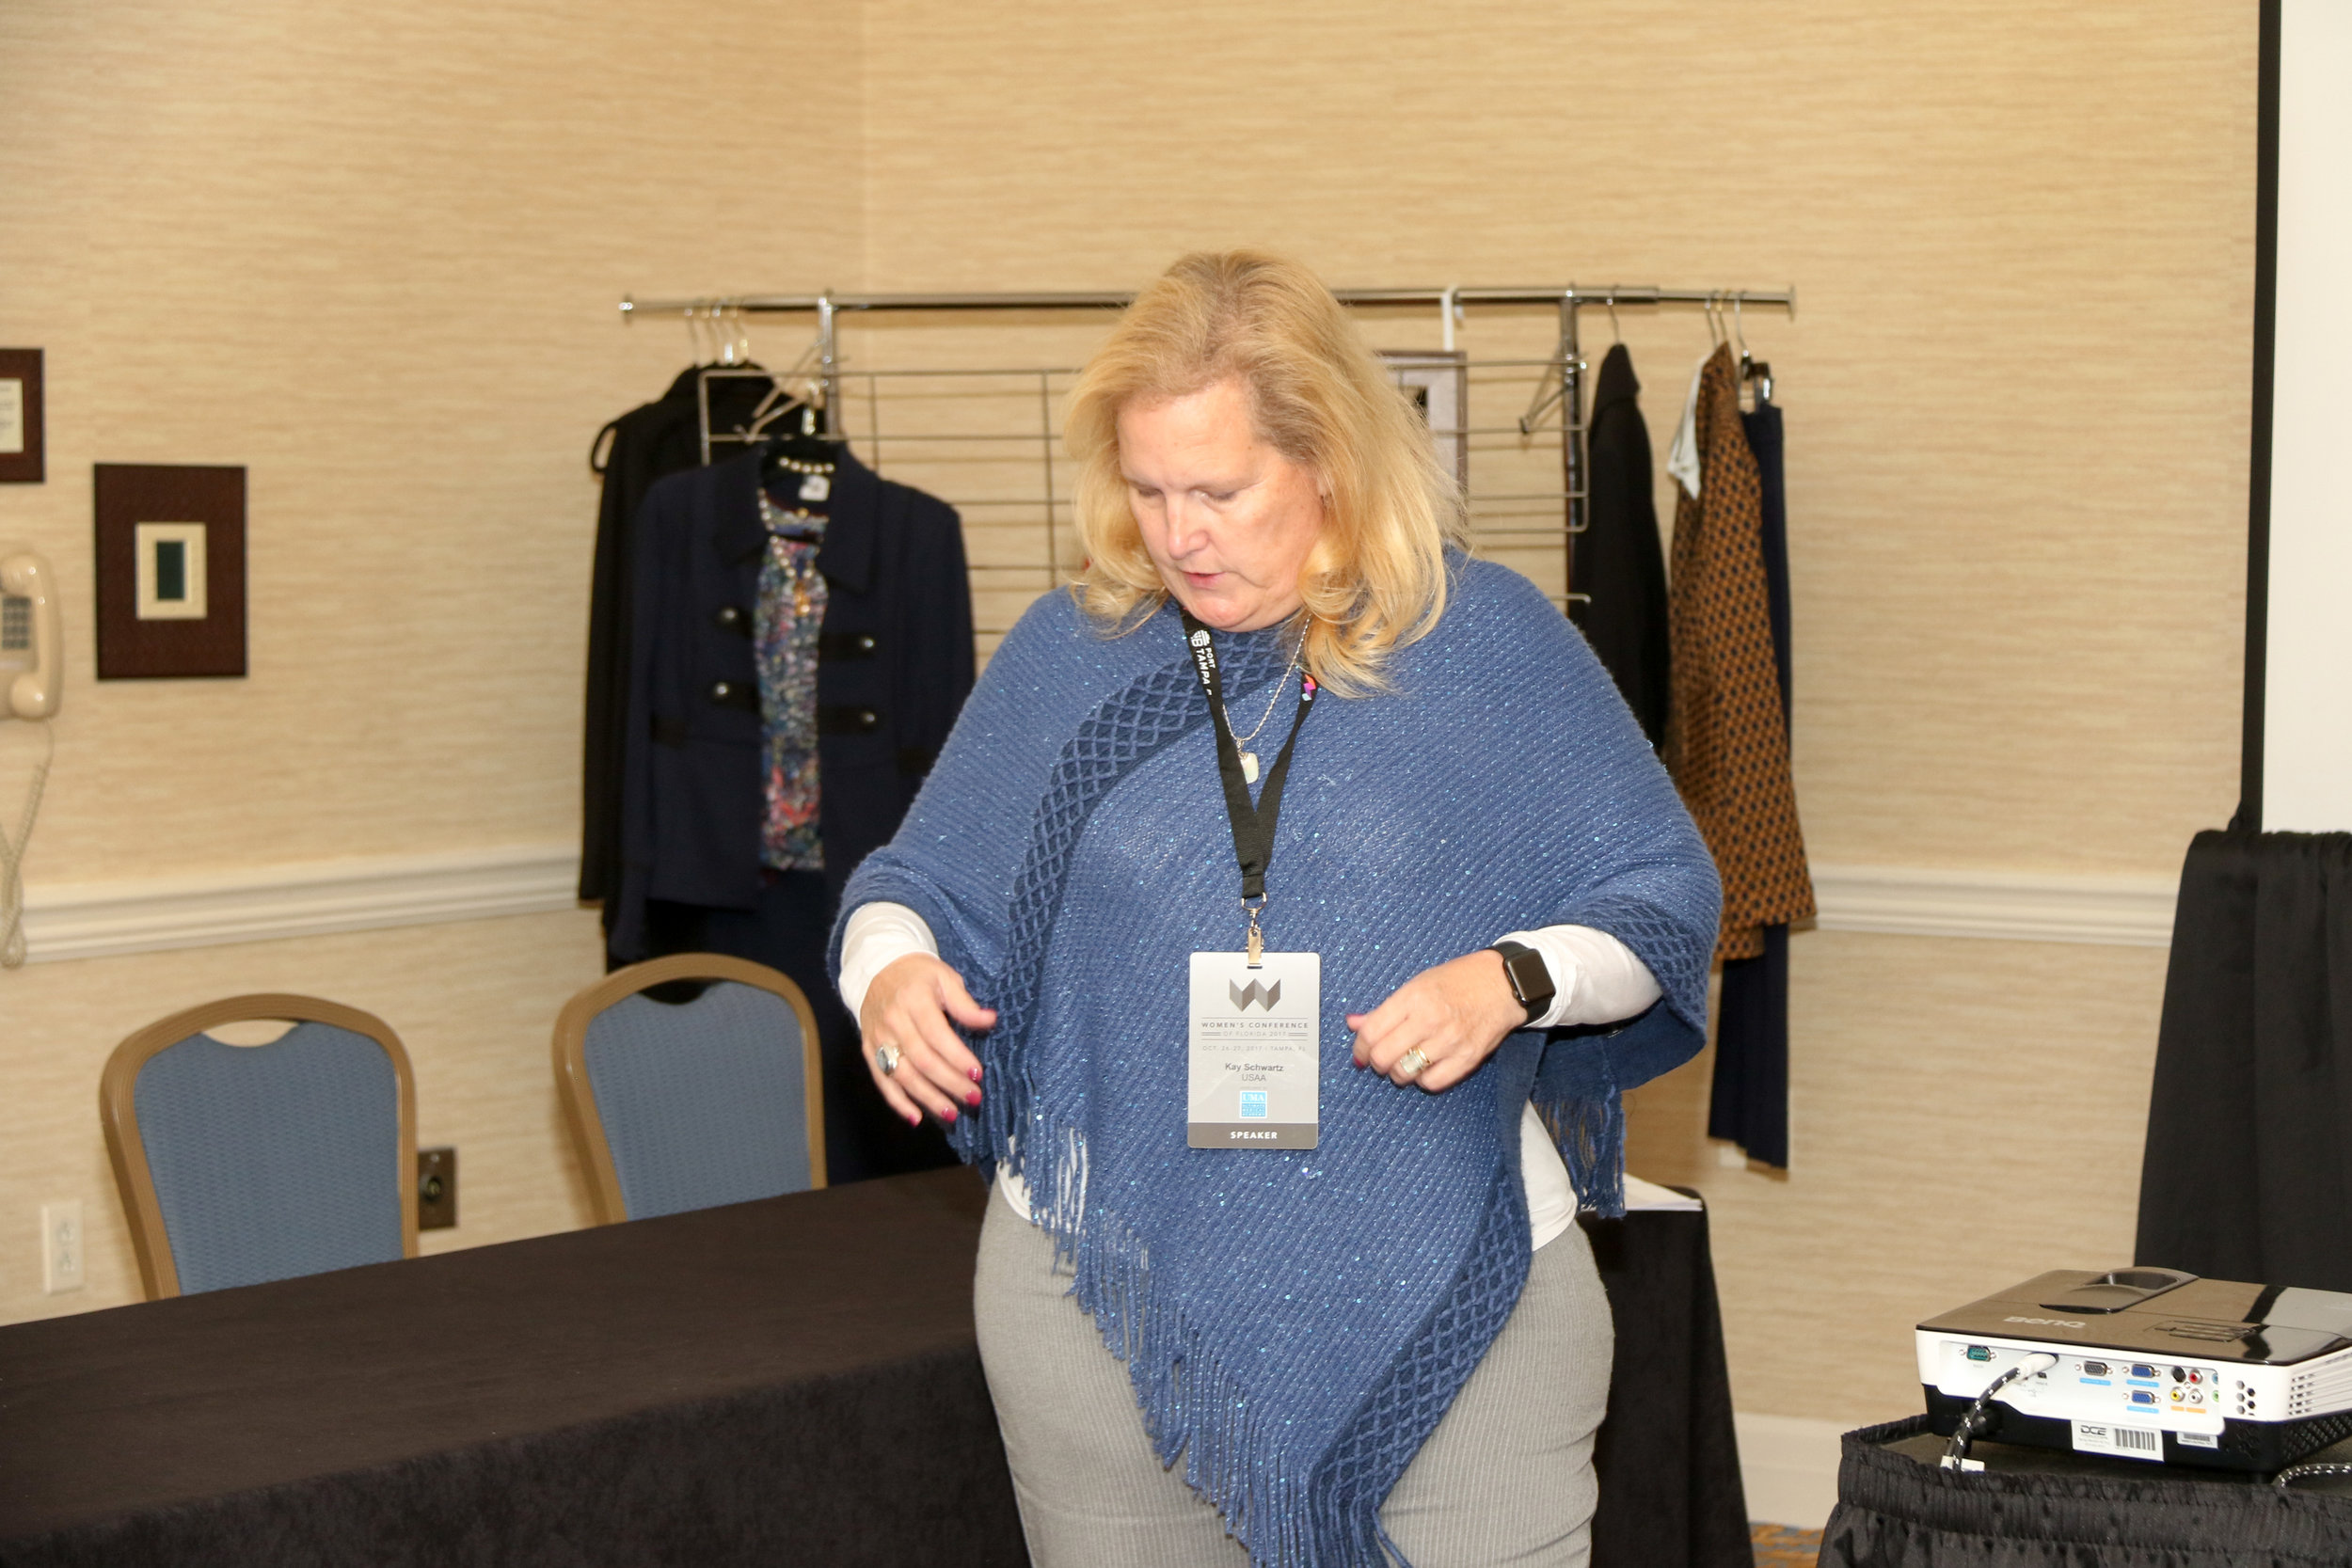 629_WomensConference_10-27-17.jpg